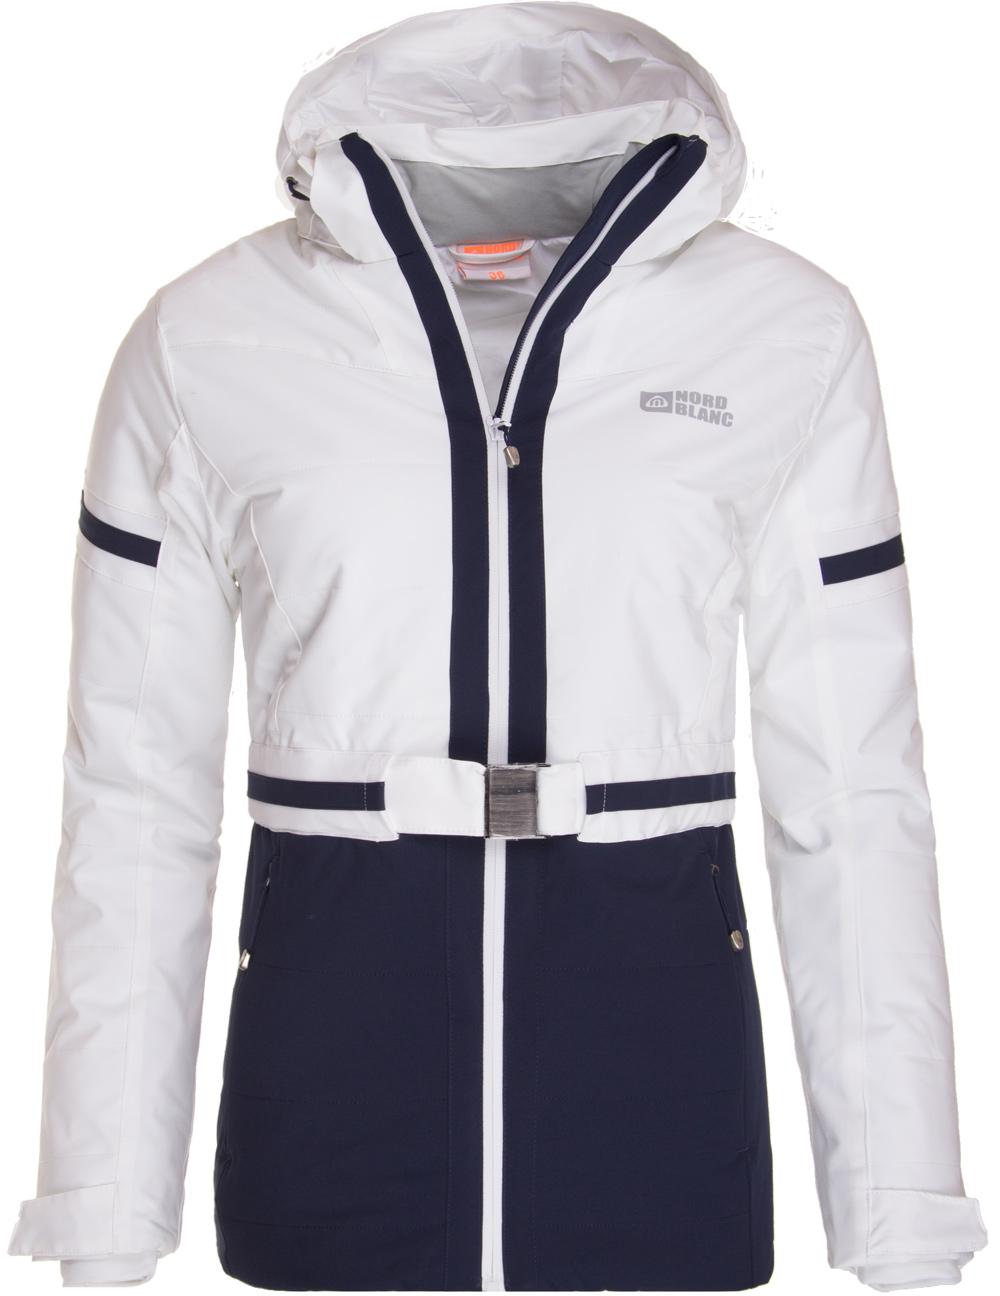 Lyžařská bunda dámska NORDBLANC Ornate - NBWJL6426